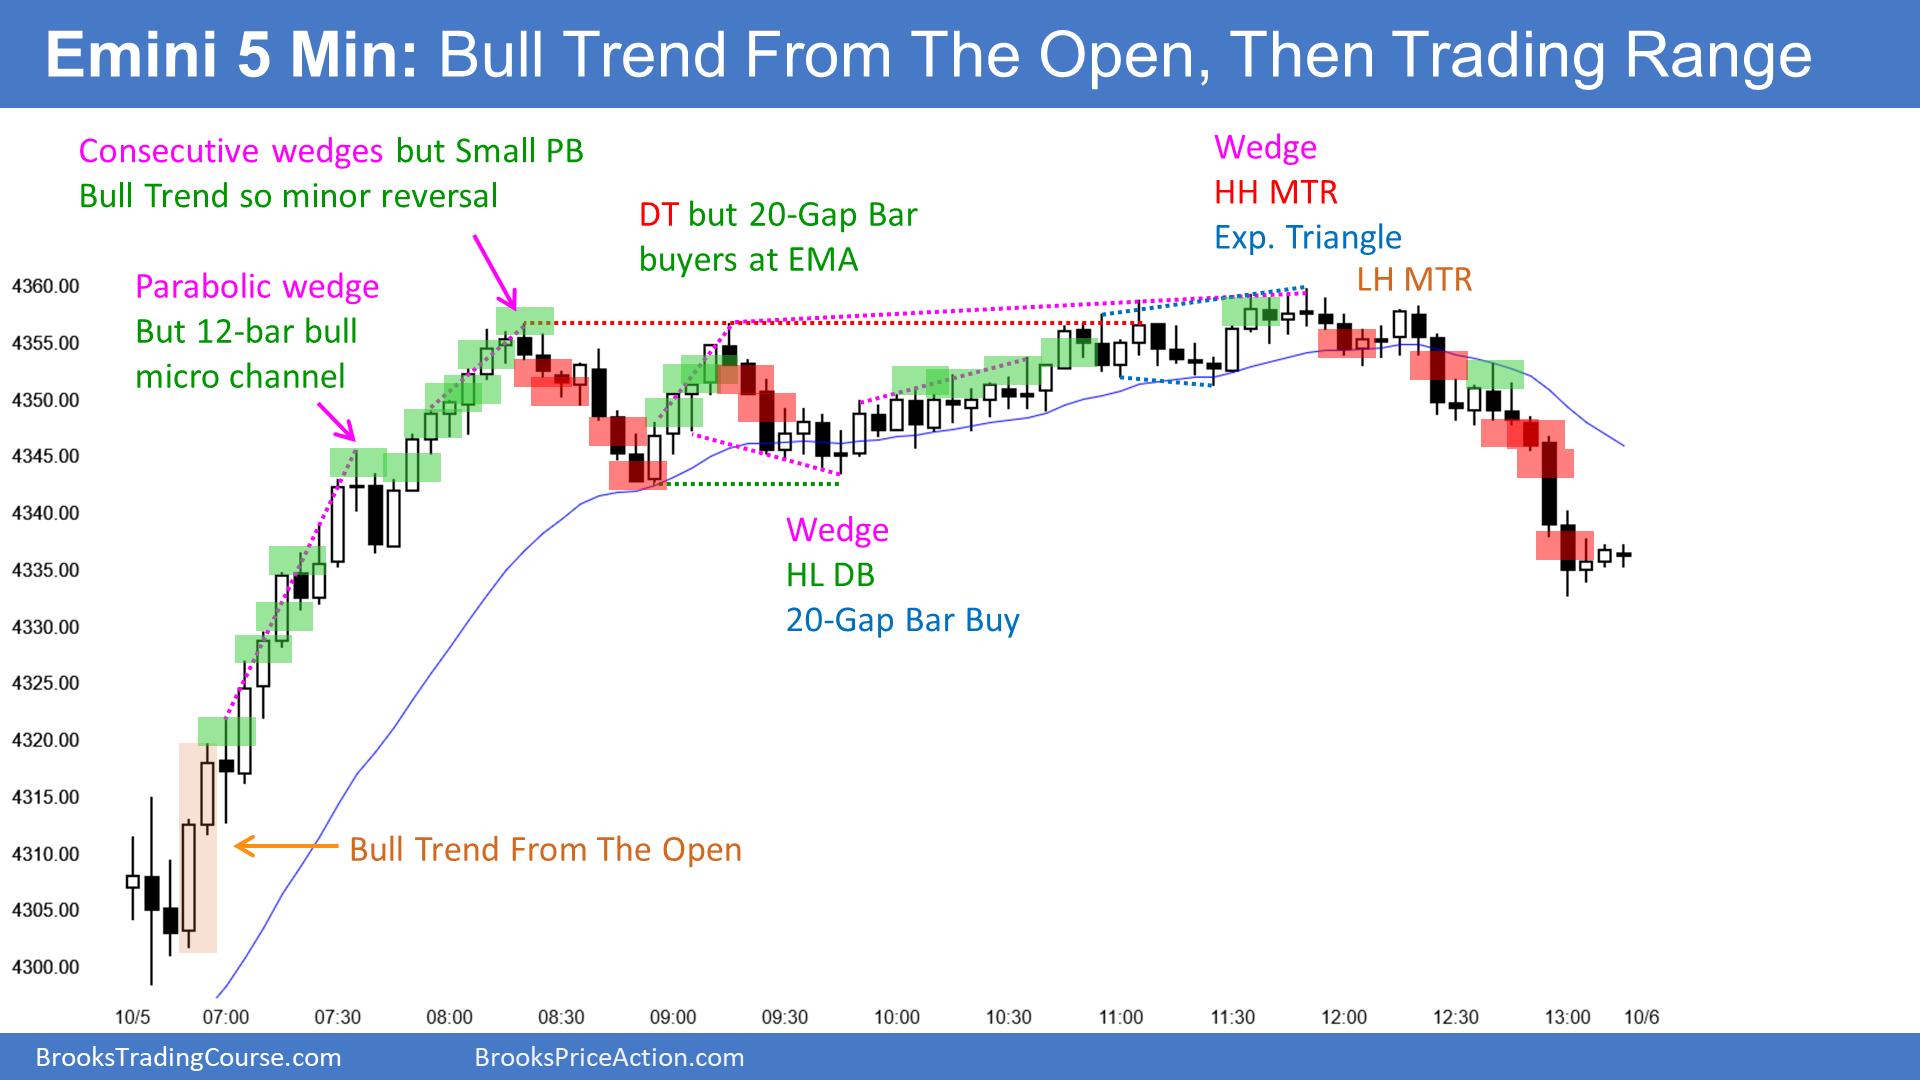 E-mini bull trend from the open then trading range